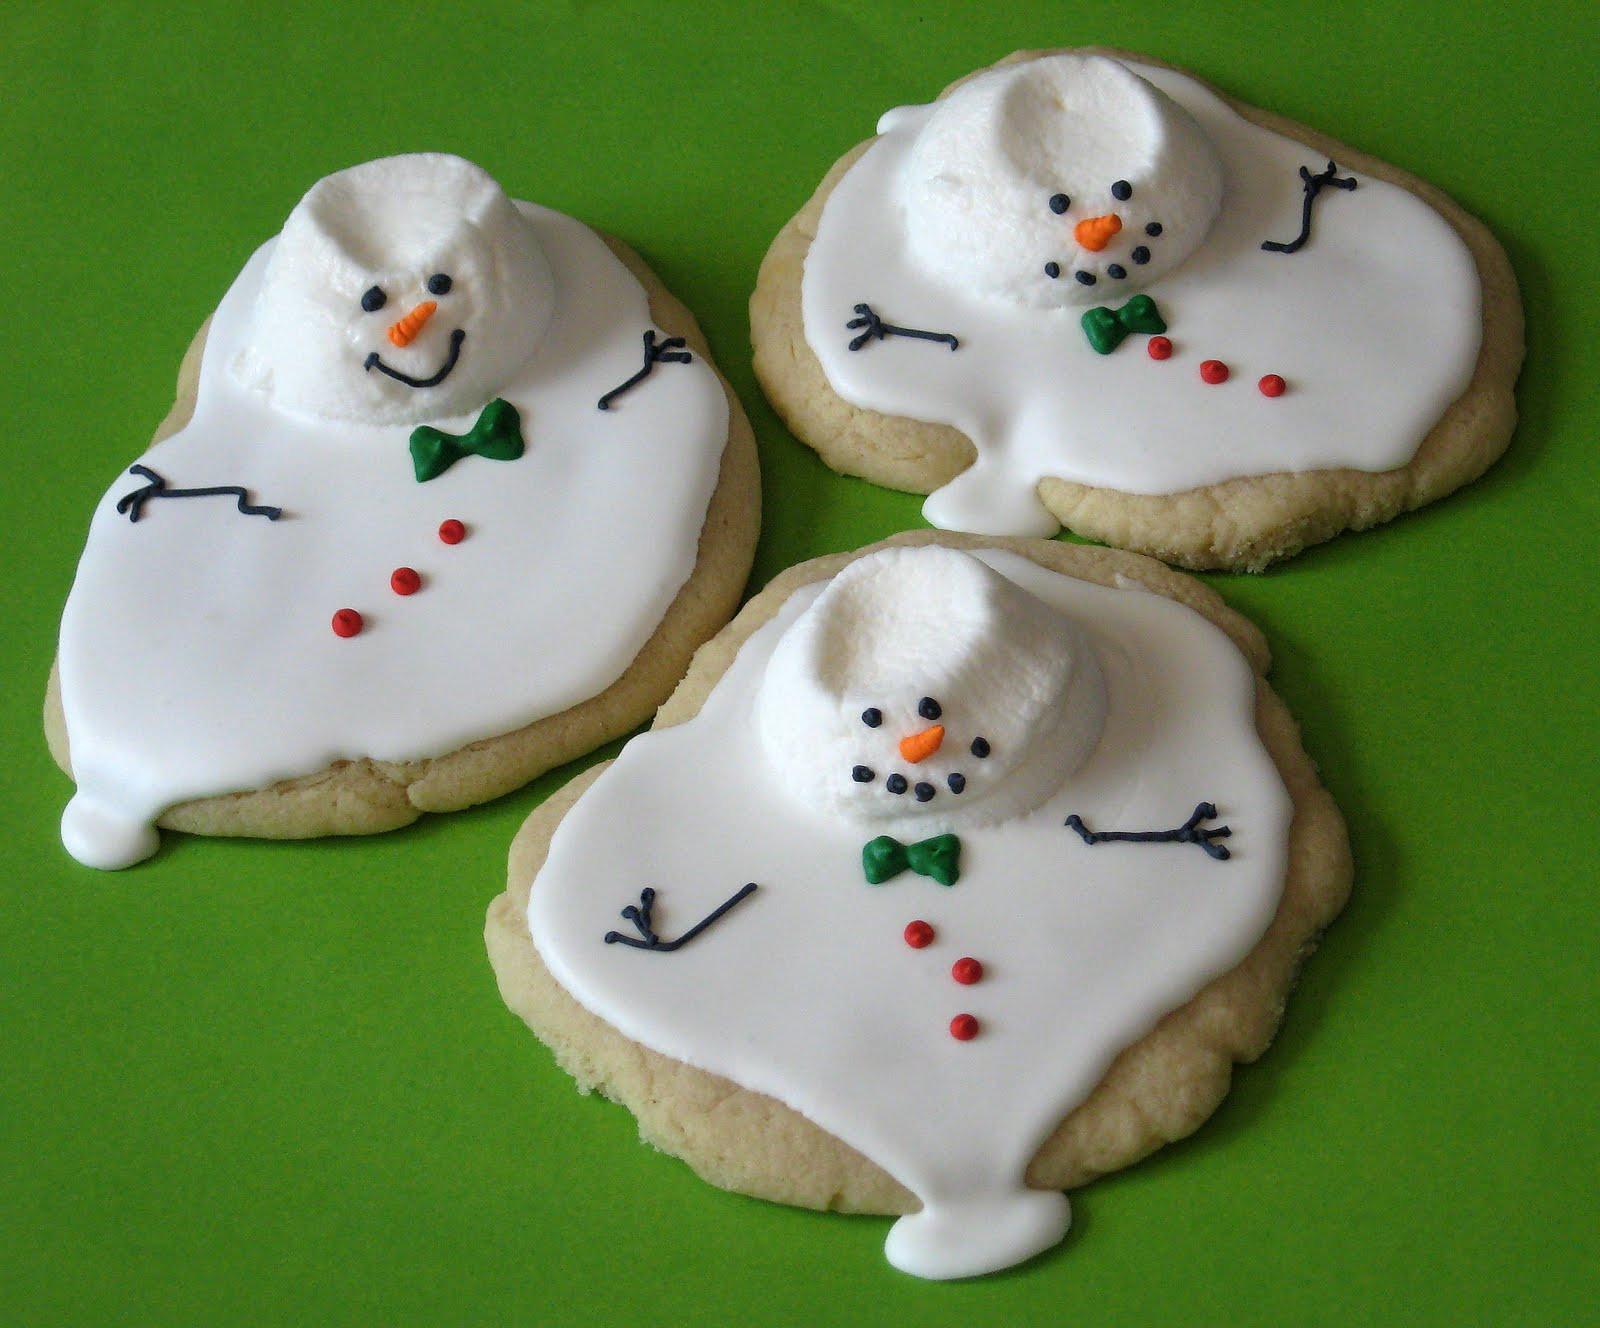 Cute Christmas Cookies Recipes  Little Boozle Christmas nibbles 3